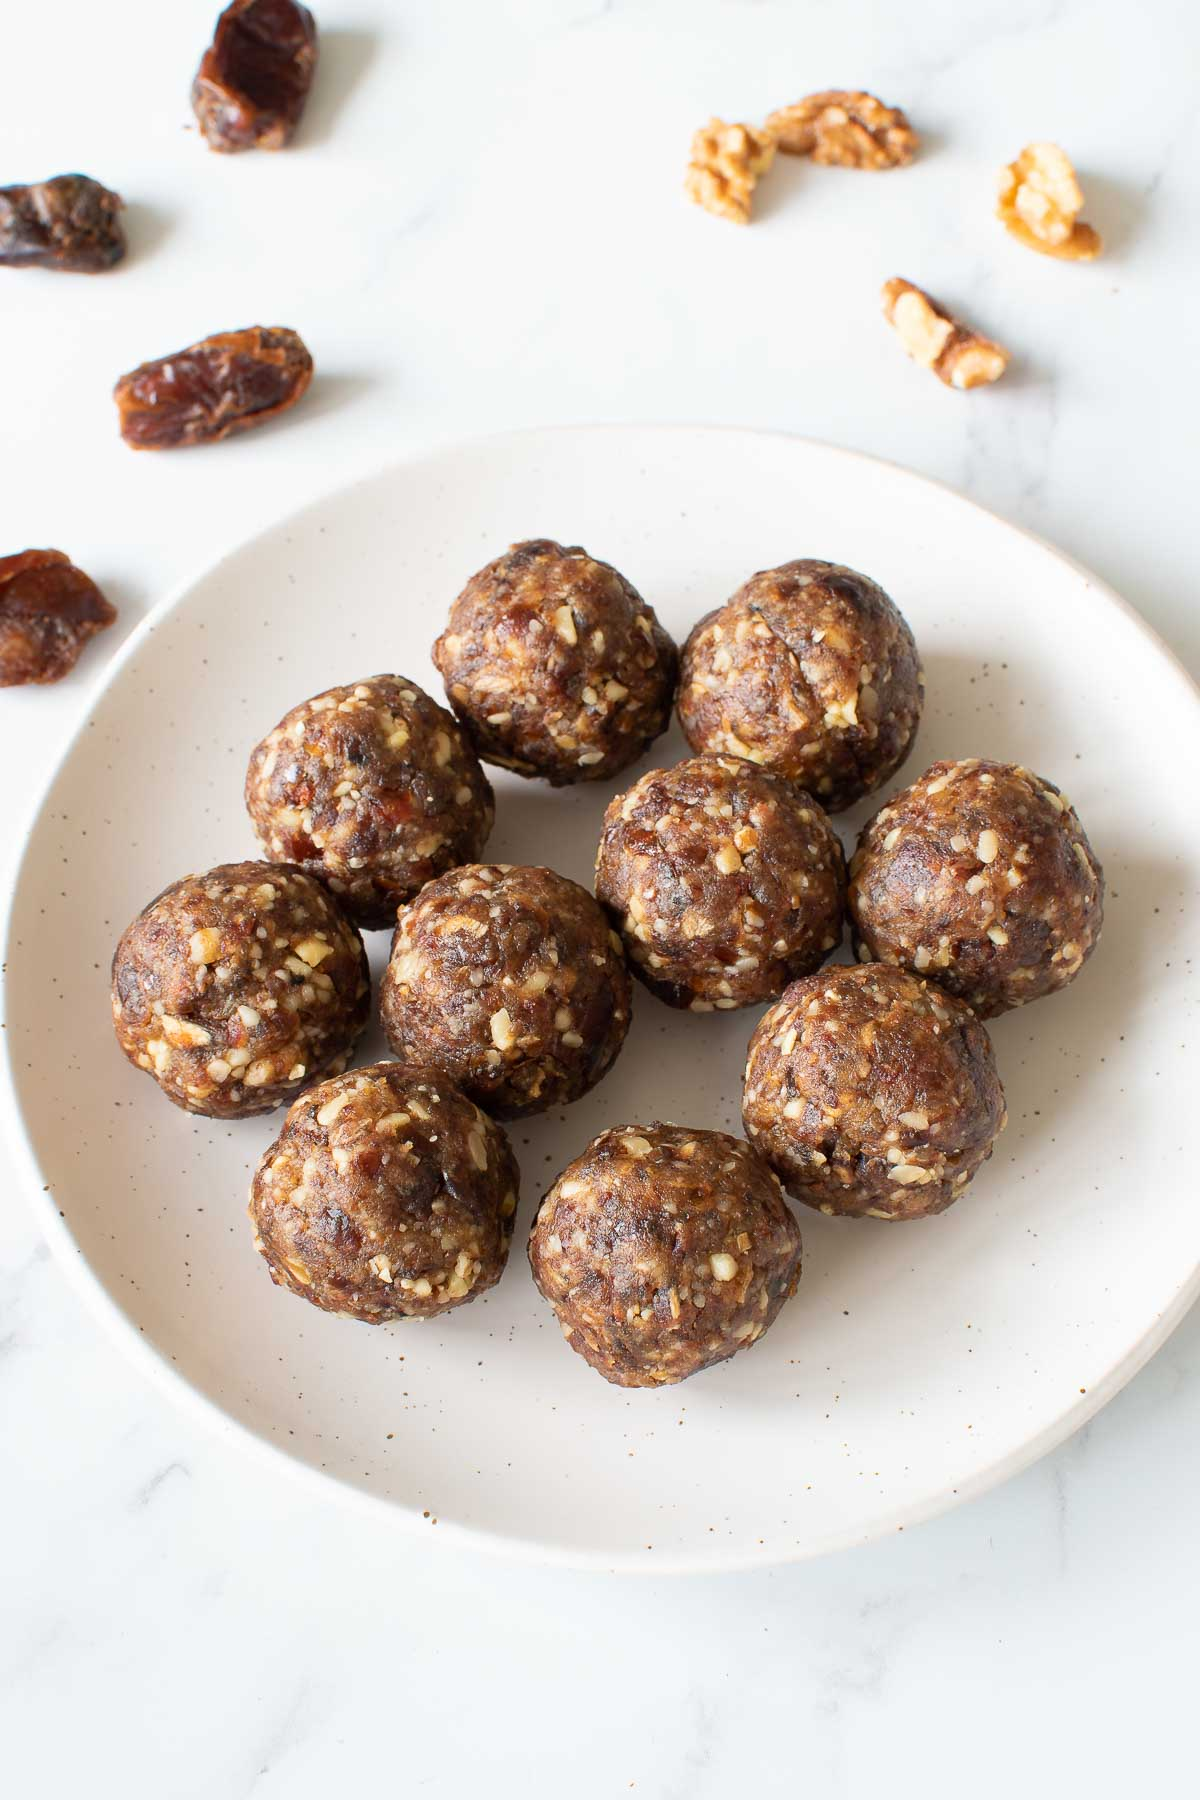 Date walnut balls on a plate.